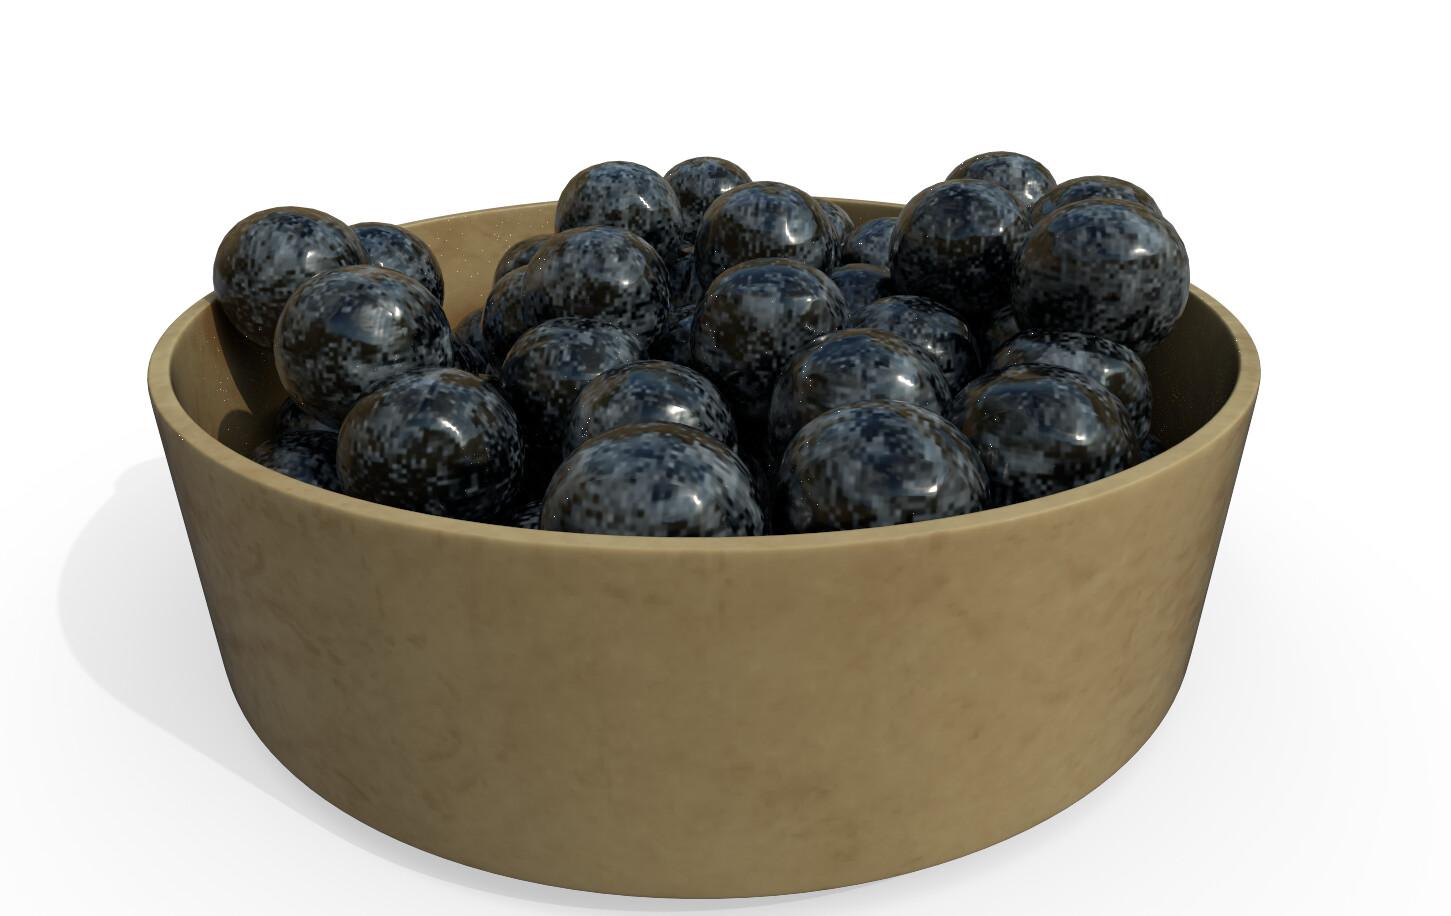 Joseph moniz blueberry001l